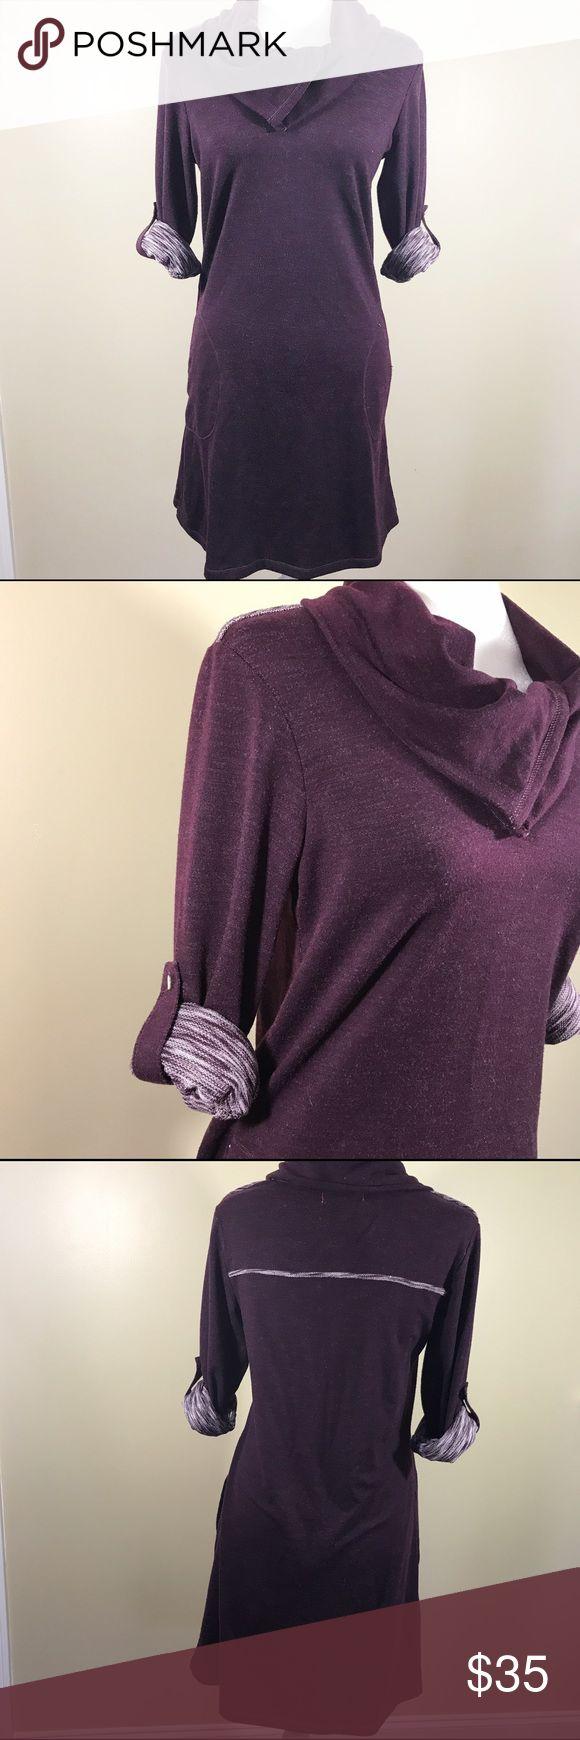 "Max Studio Weekend burgundy sweater dress ✨ Excellent condition, size Small. Armpit to armpit 18"" Armpit down 27"" Shoulders down 35"" Max Studio Dresses"